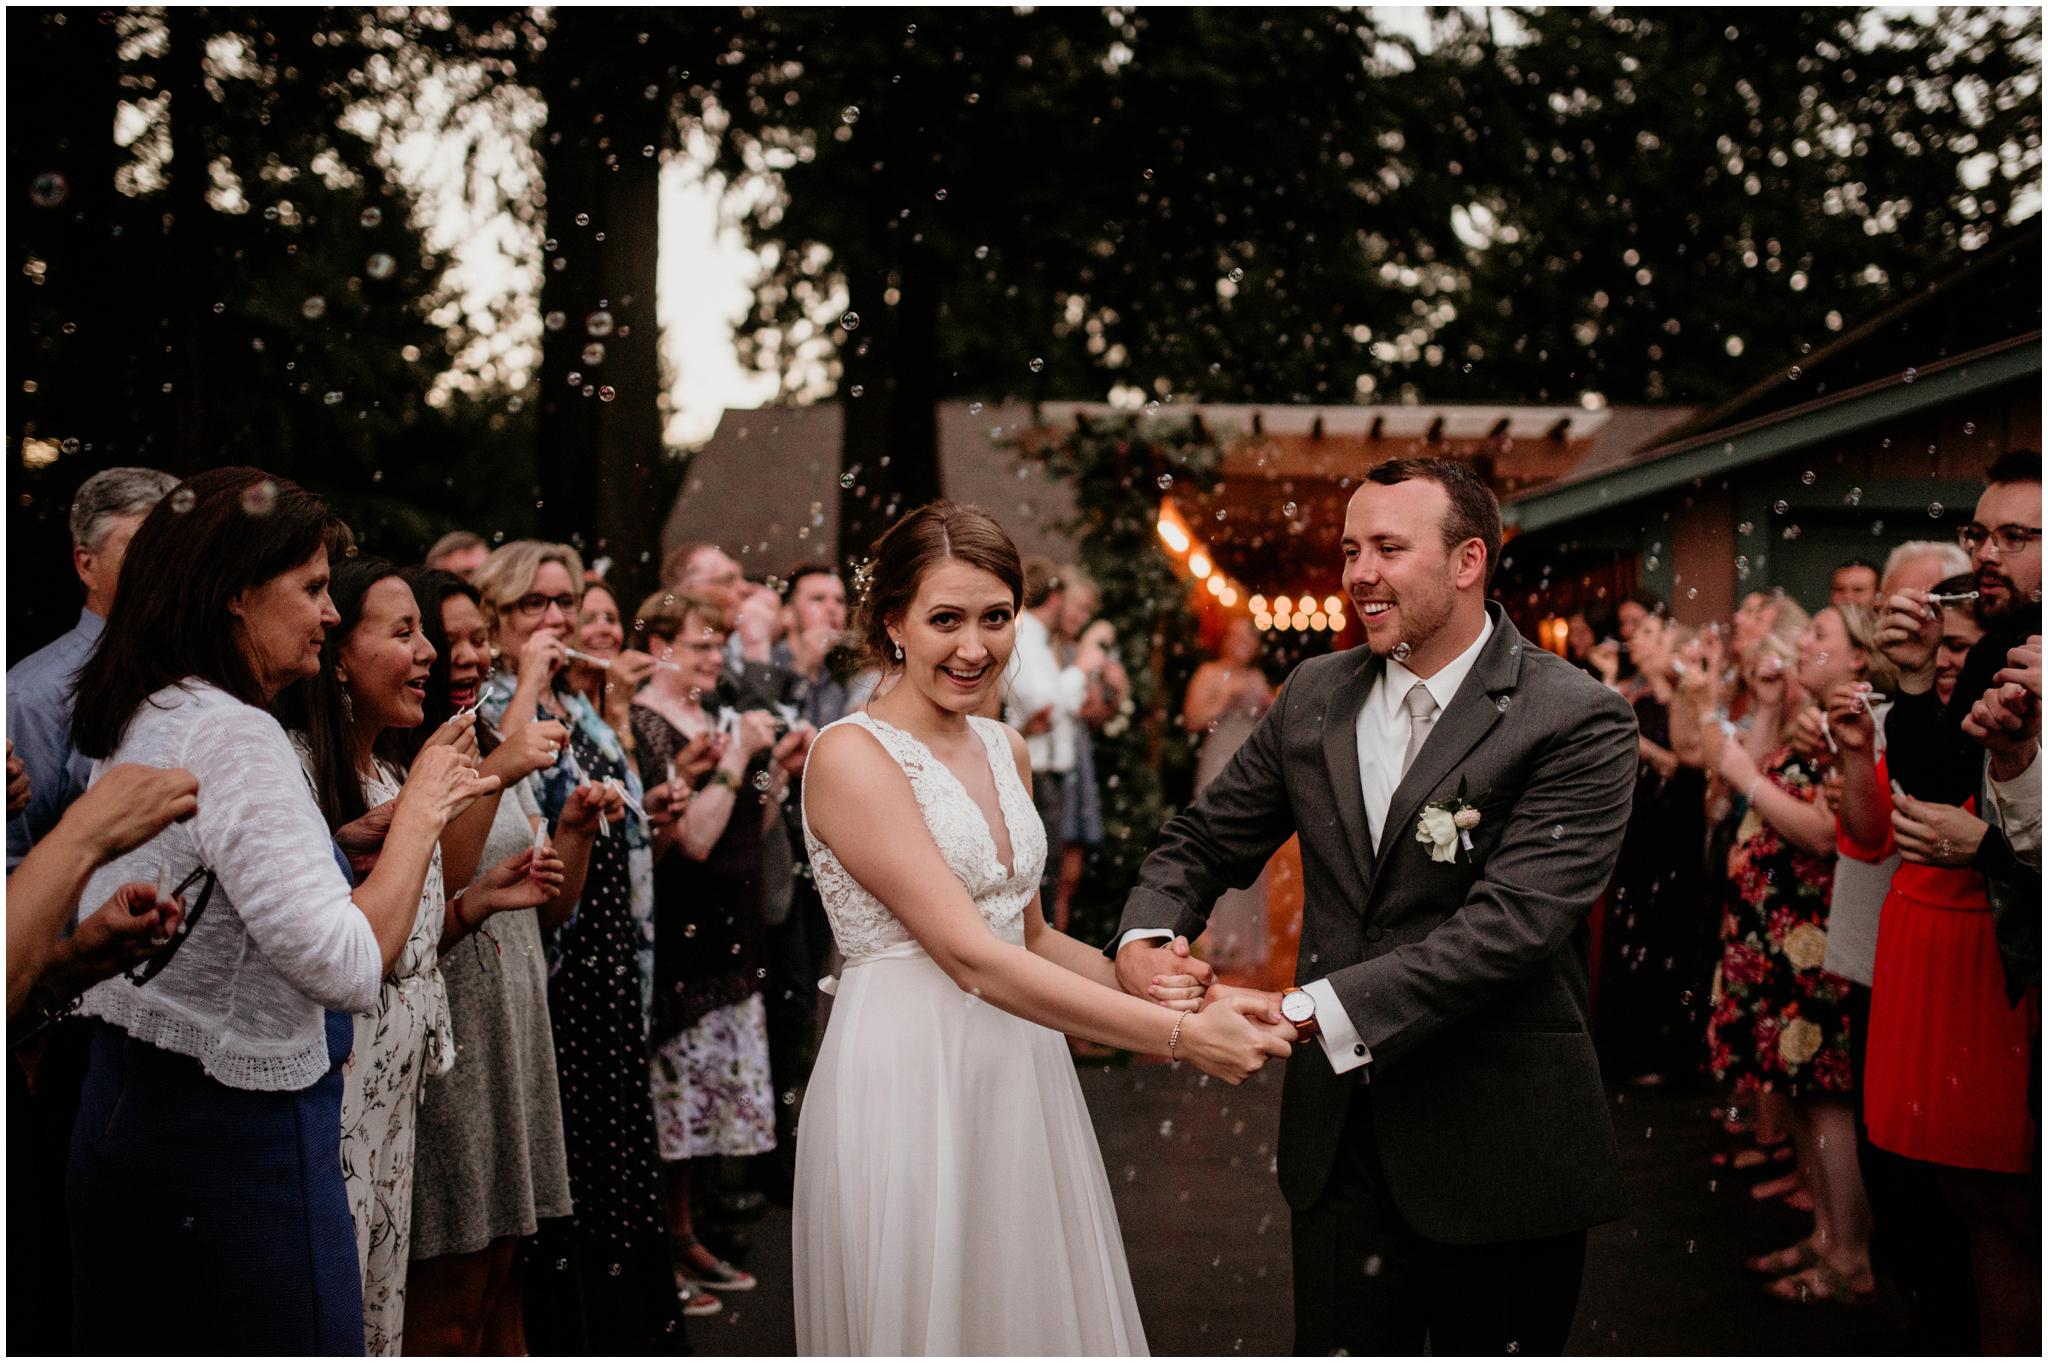 erin-and-tyler-evergreen-gardens-bellingham-wedding-photographer-160.jpg